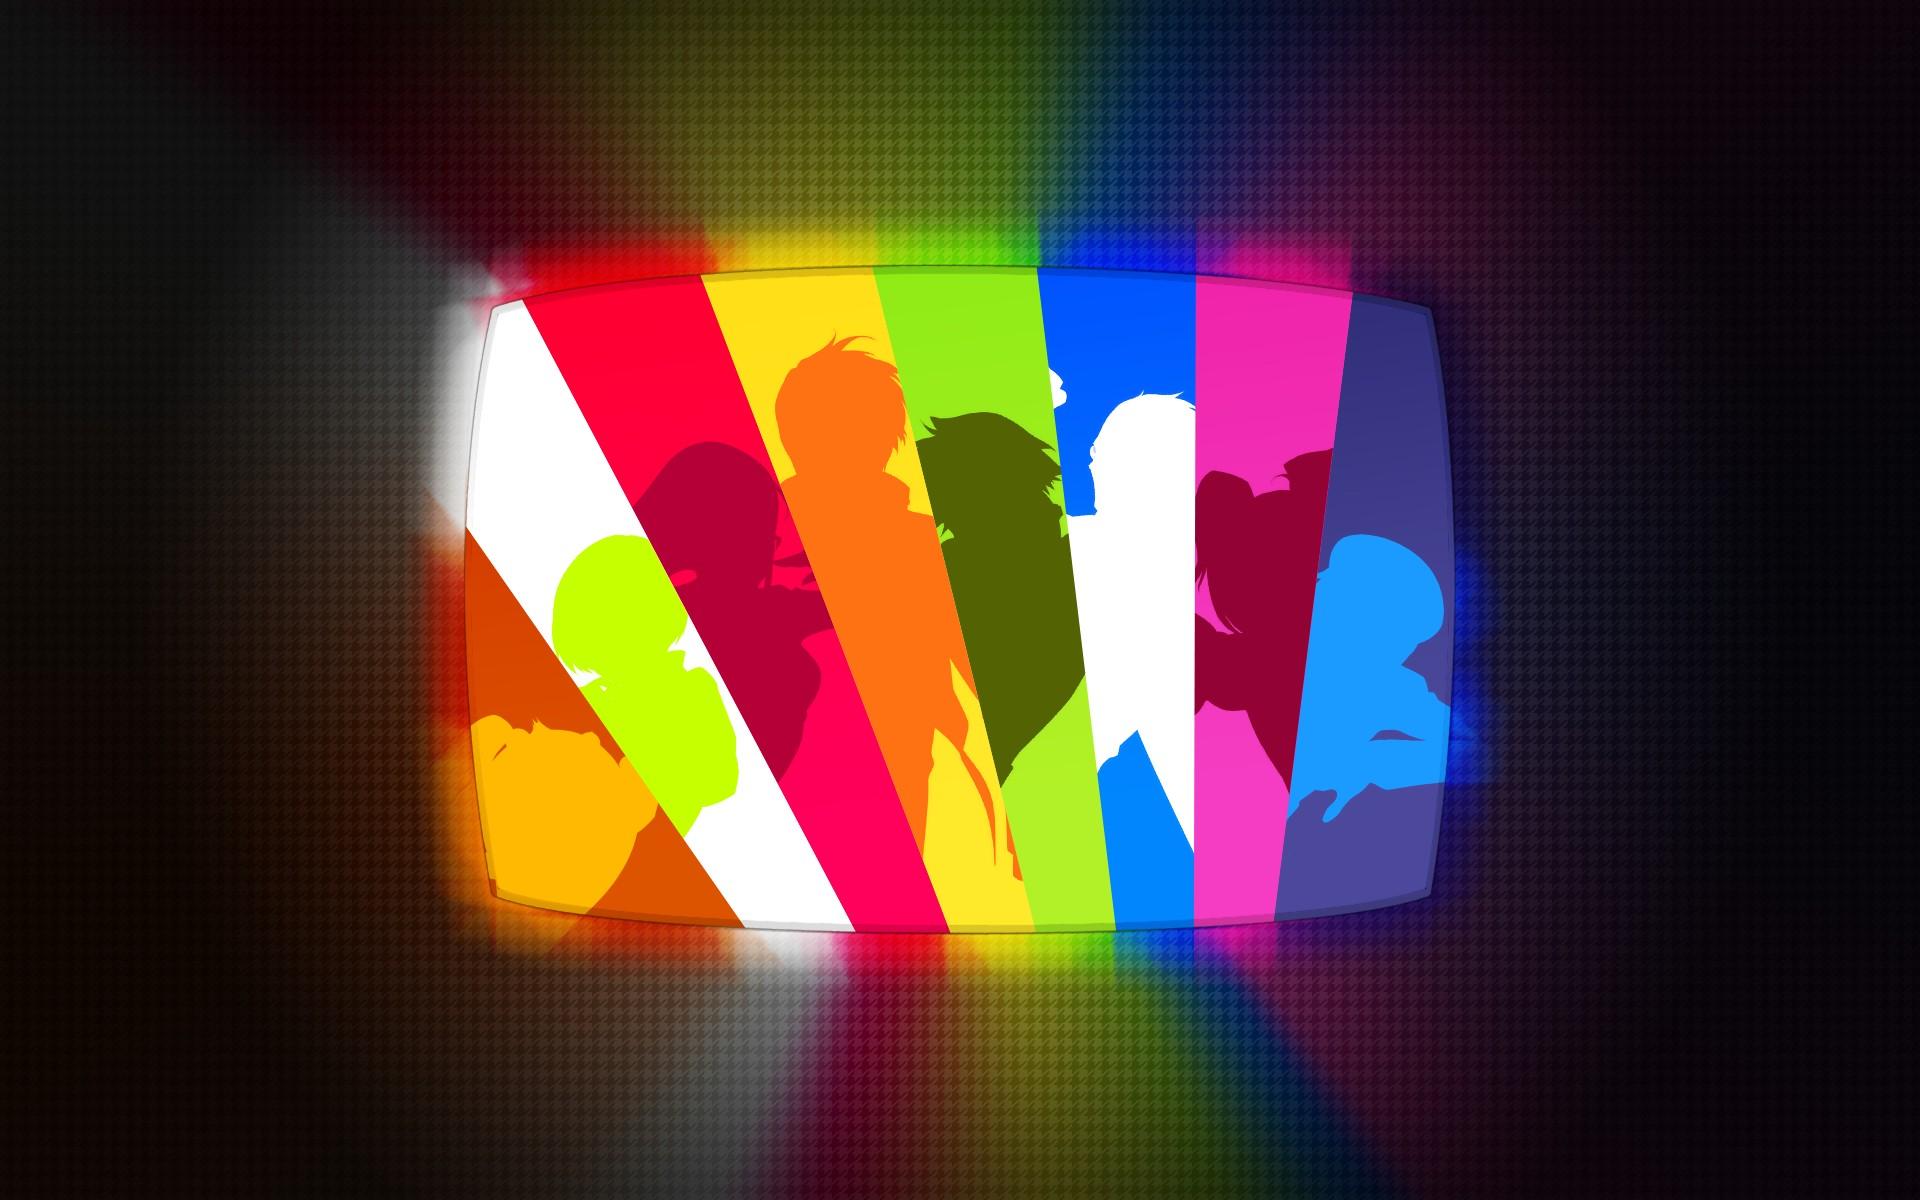 Minimalist Wallpaper Iphone X Persona Wallpaper 183 ① Download Free Stunning Hd Wallpapers